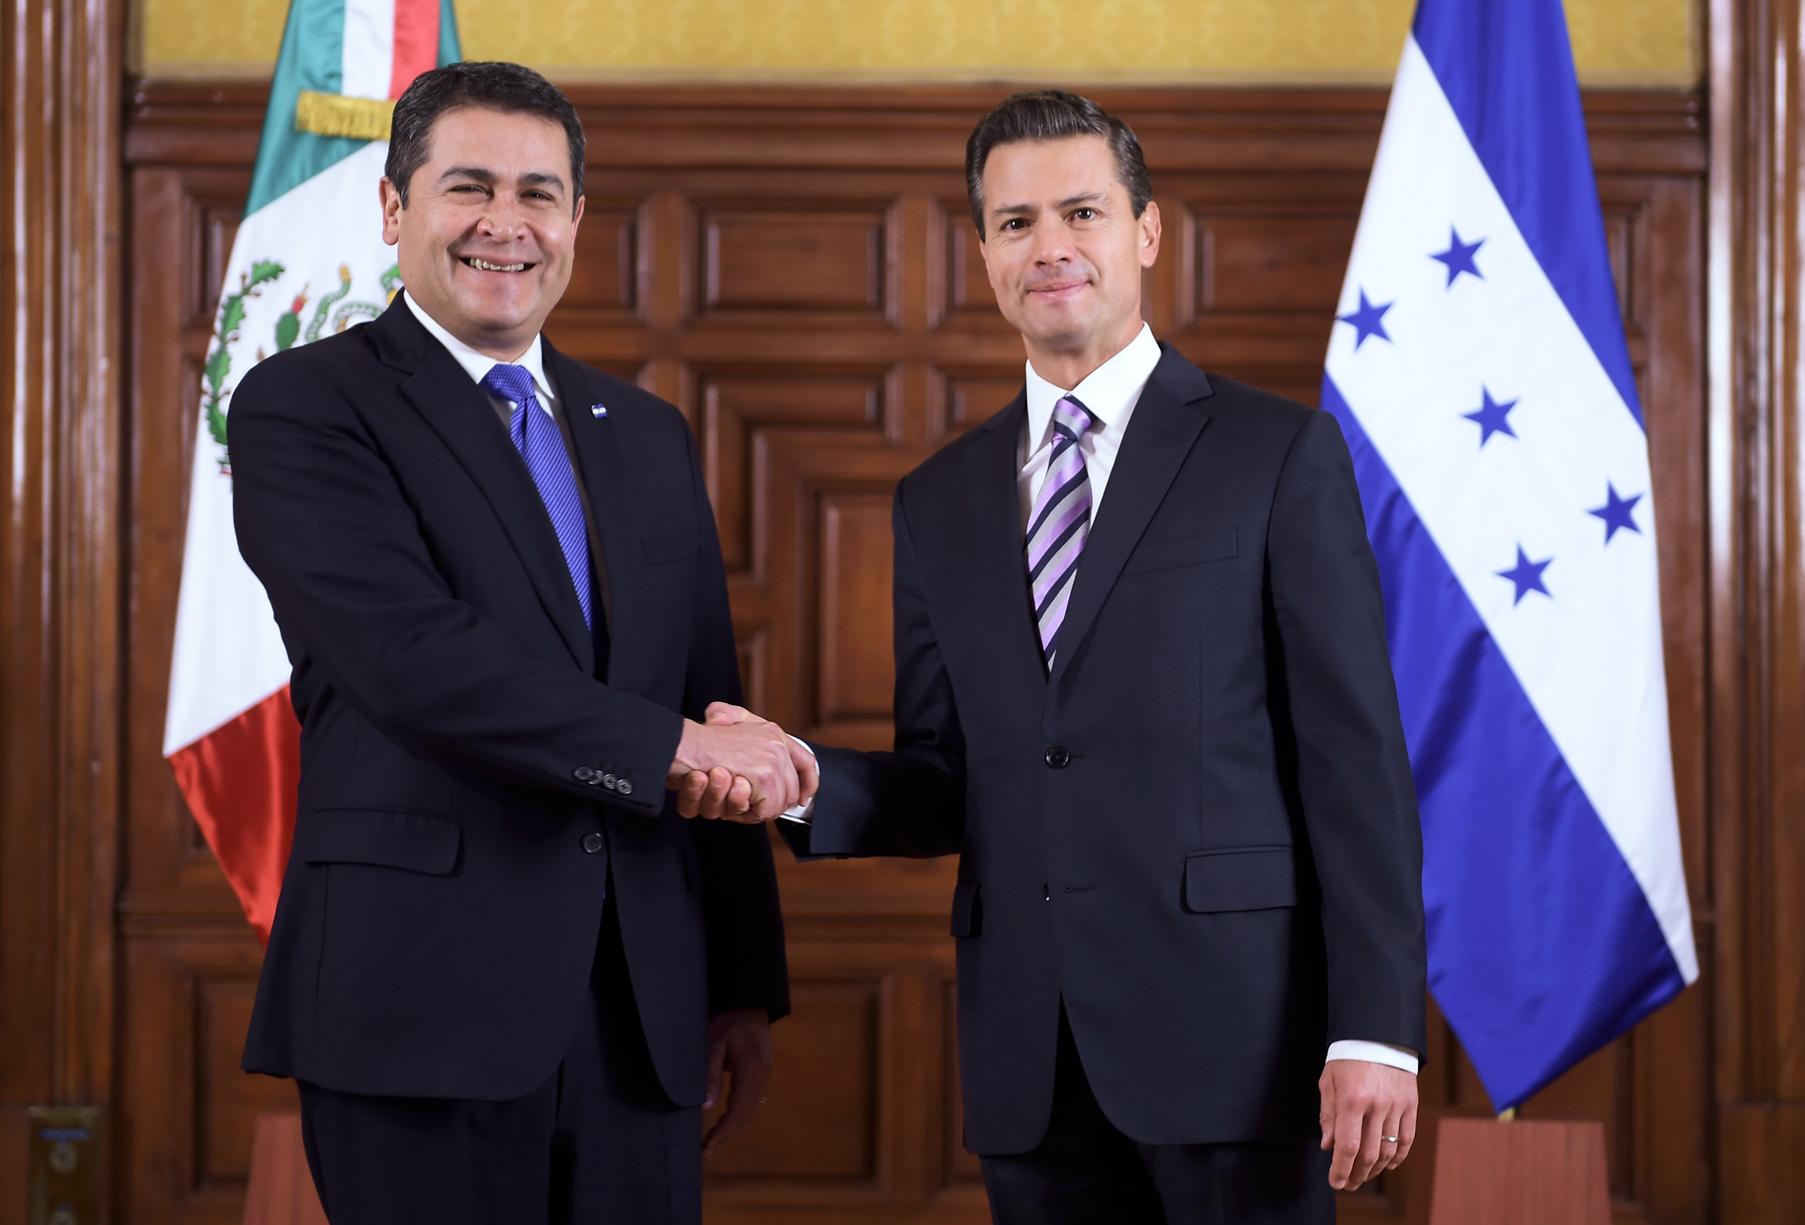 Hondurasmexico Relations Wikipedia